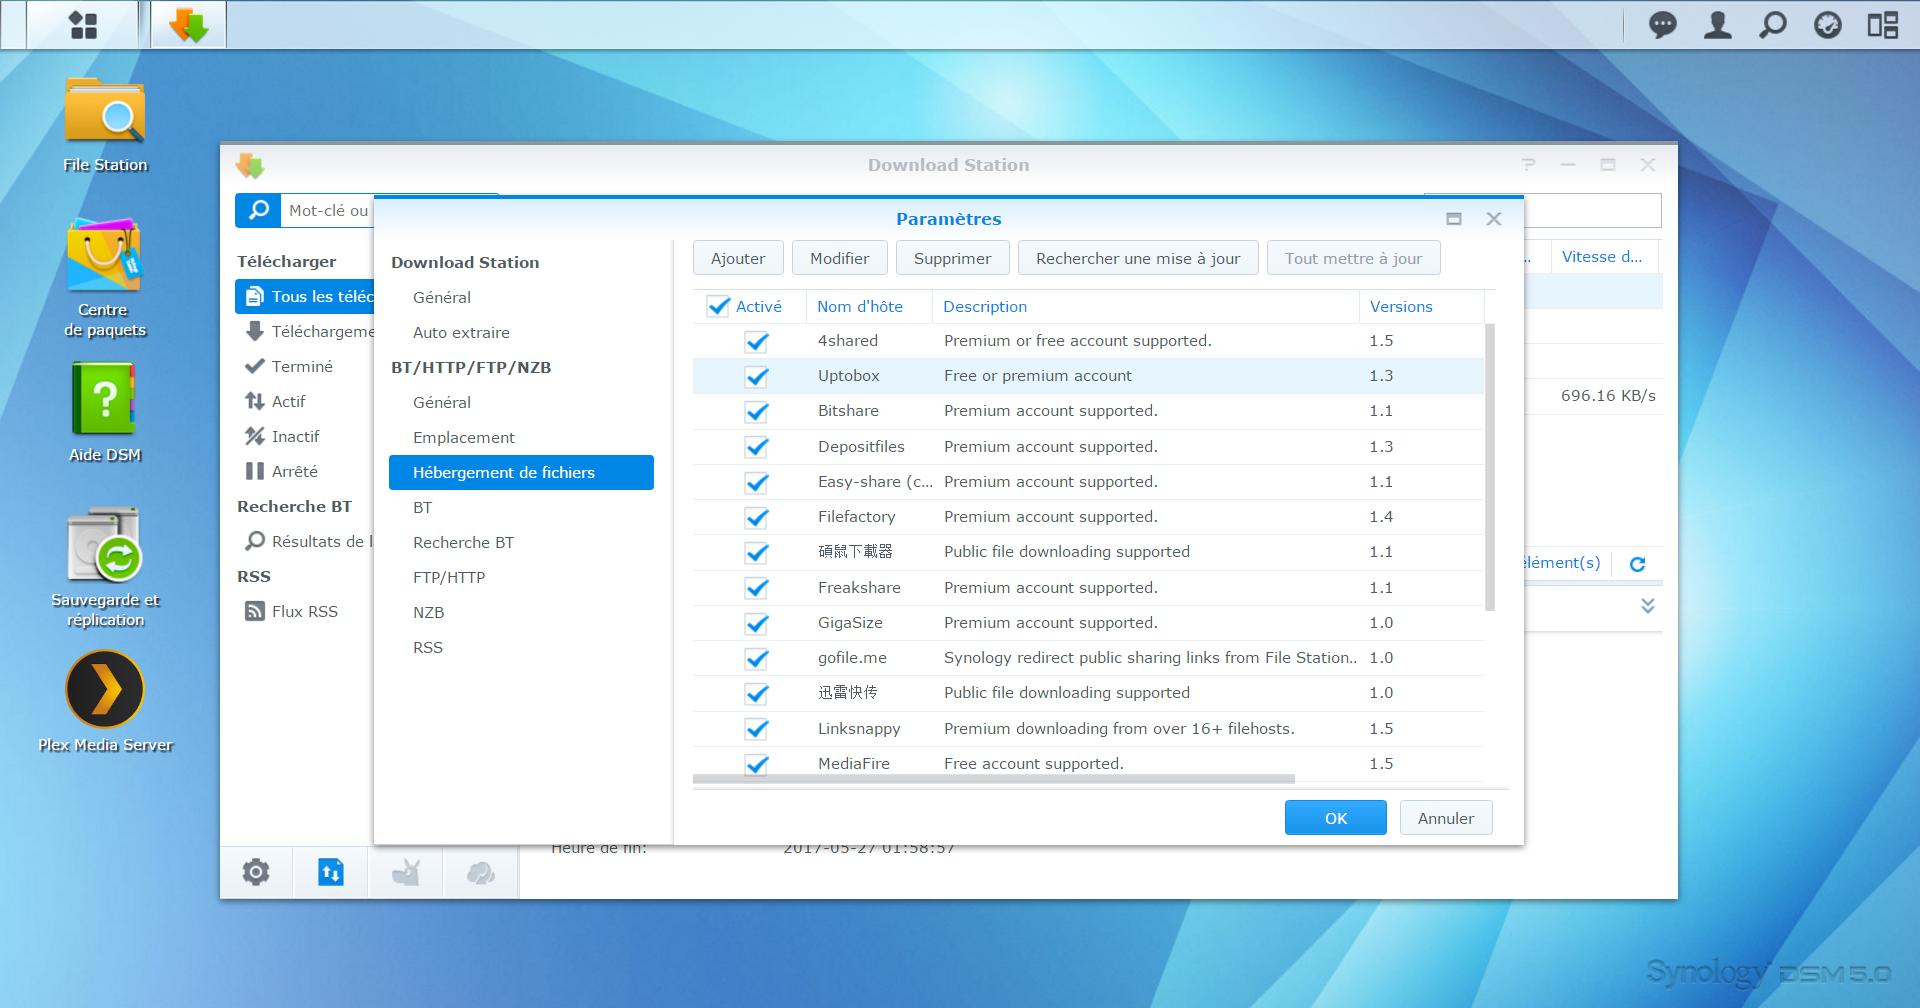 Fichier Host Uptobox / Host File Uptobox - Page 12